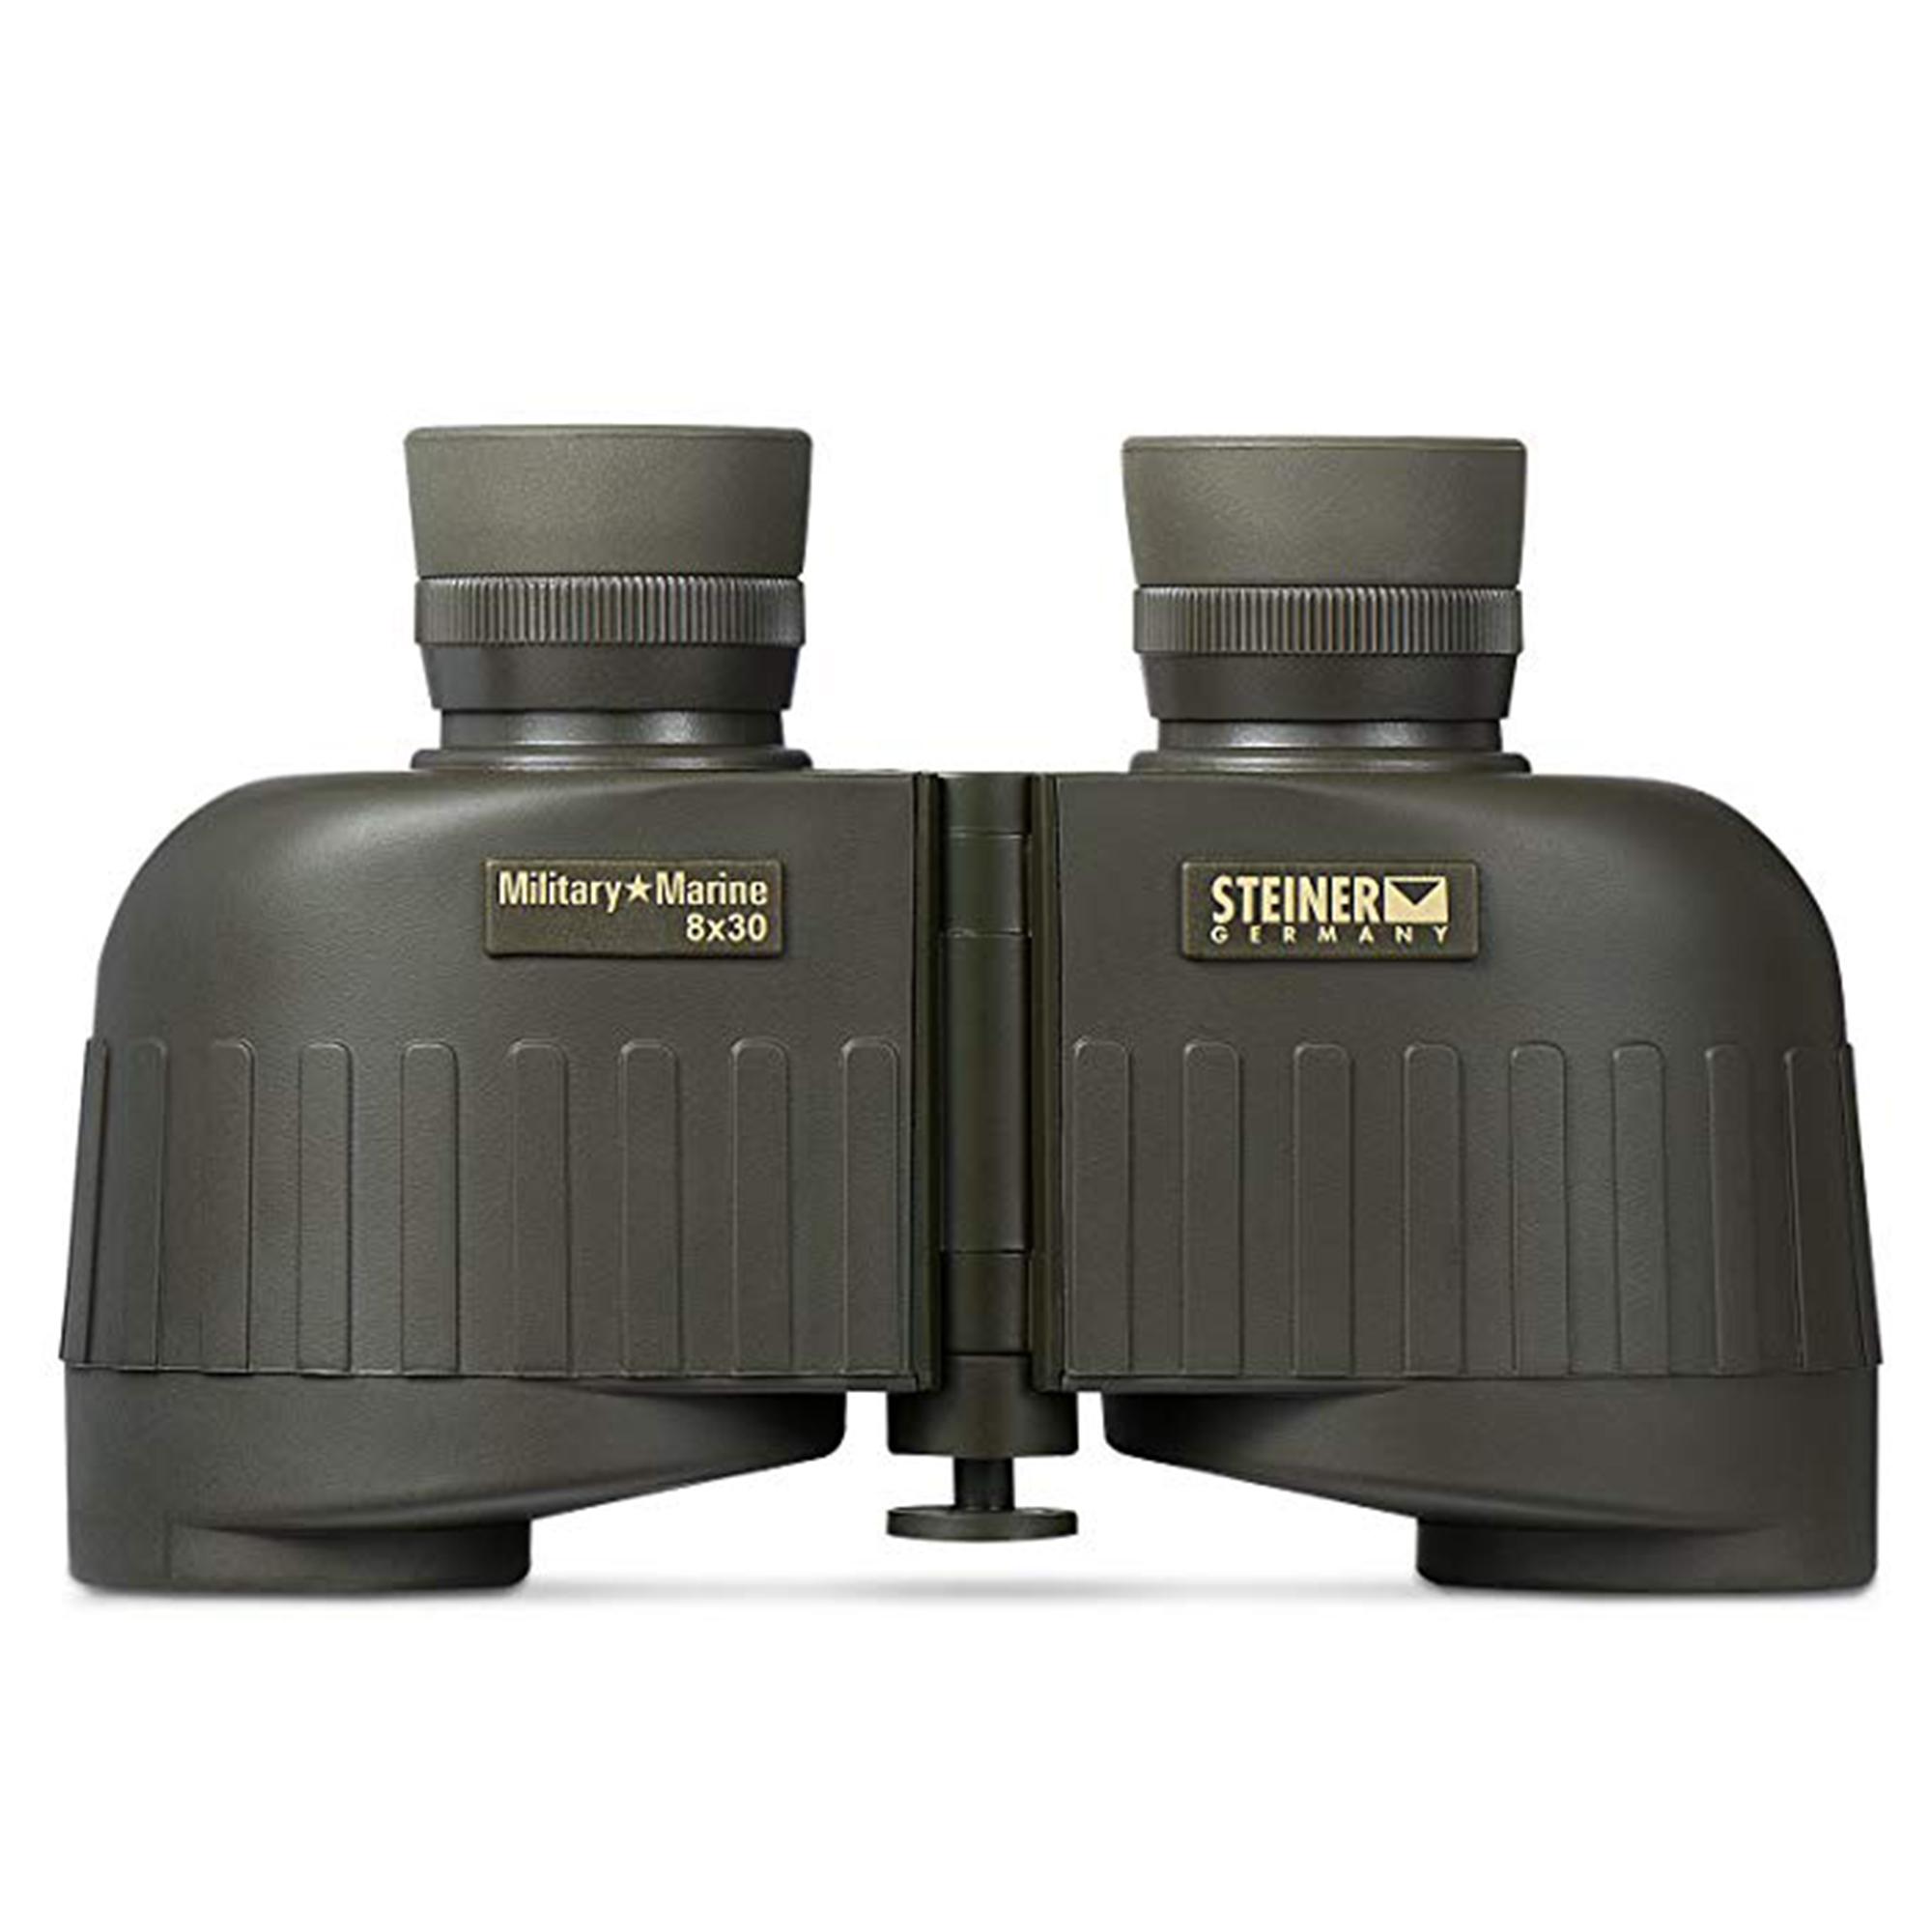 Steiner Sagor II 8 X 30 Binocular